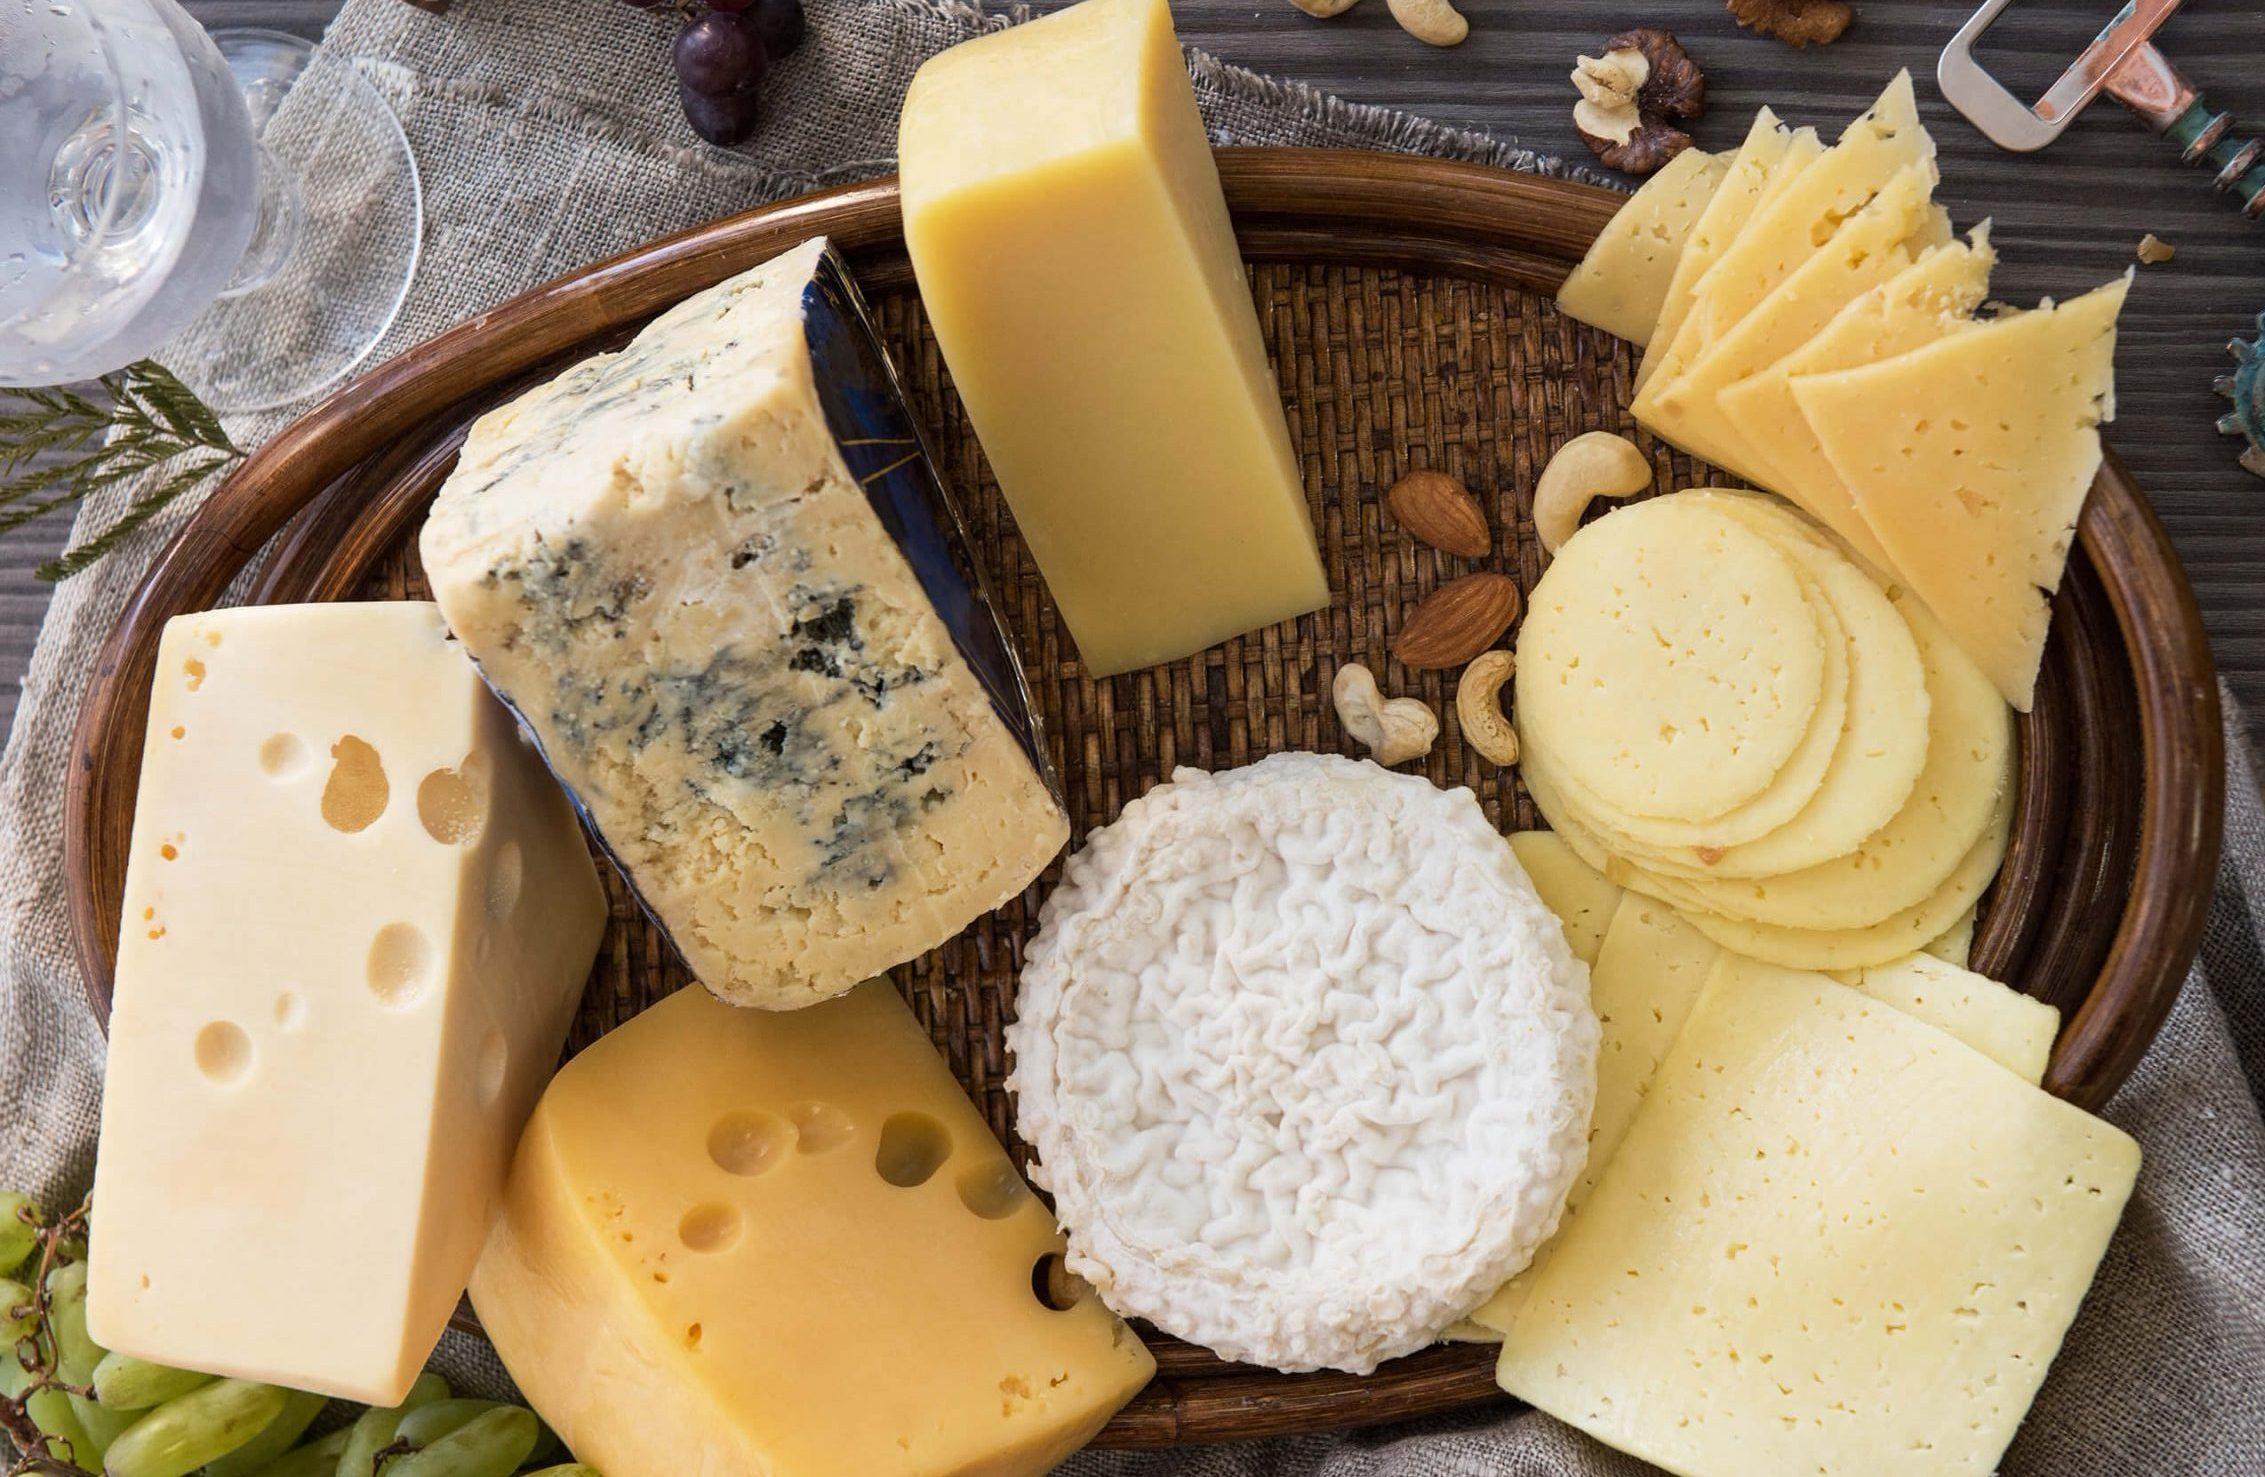 Shredded cheese, cheese block, different form of cheese – mozzarella, edam, feta, halloumi, cheddar, cream cheese